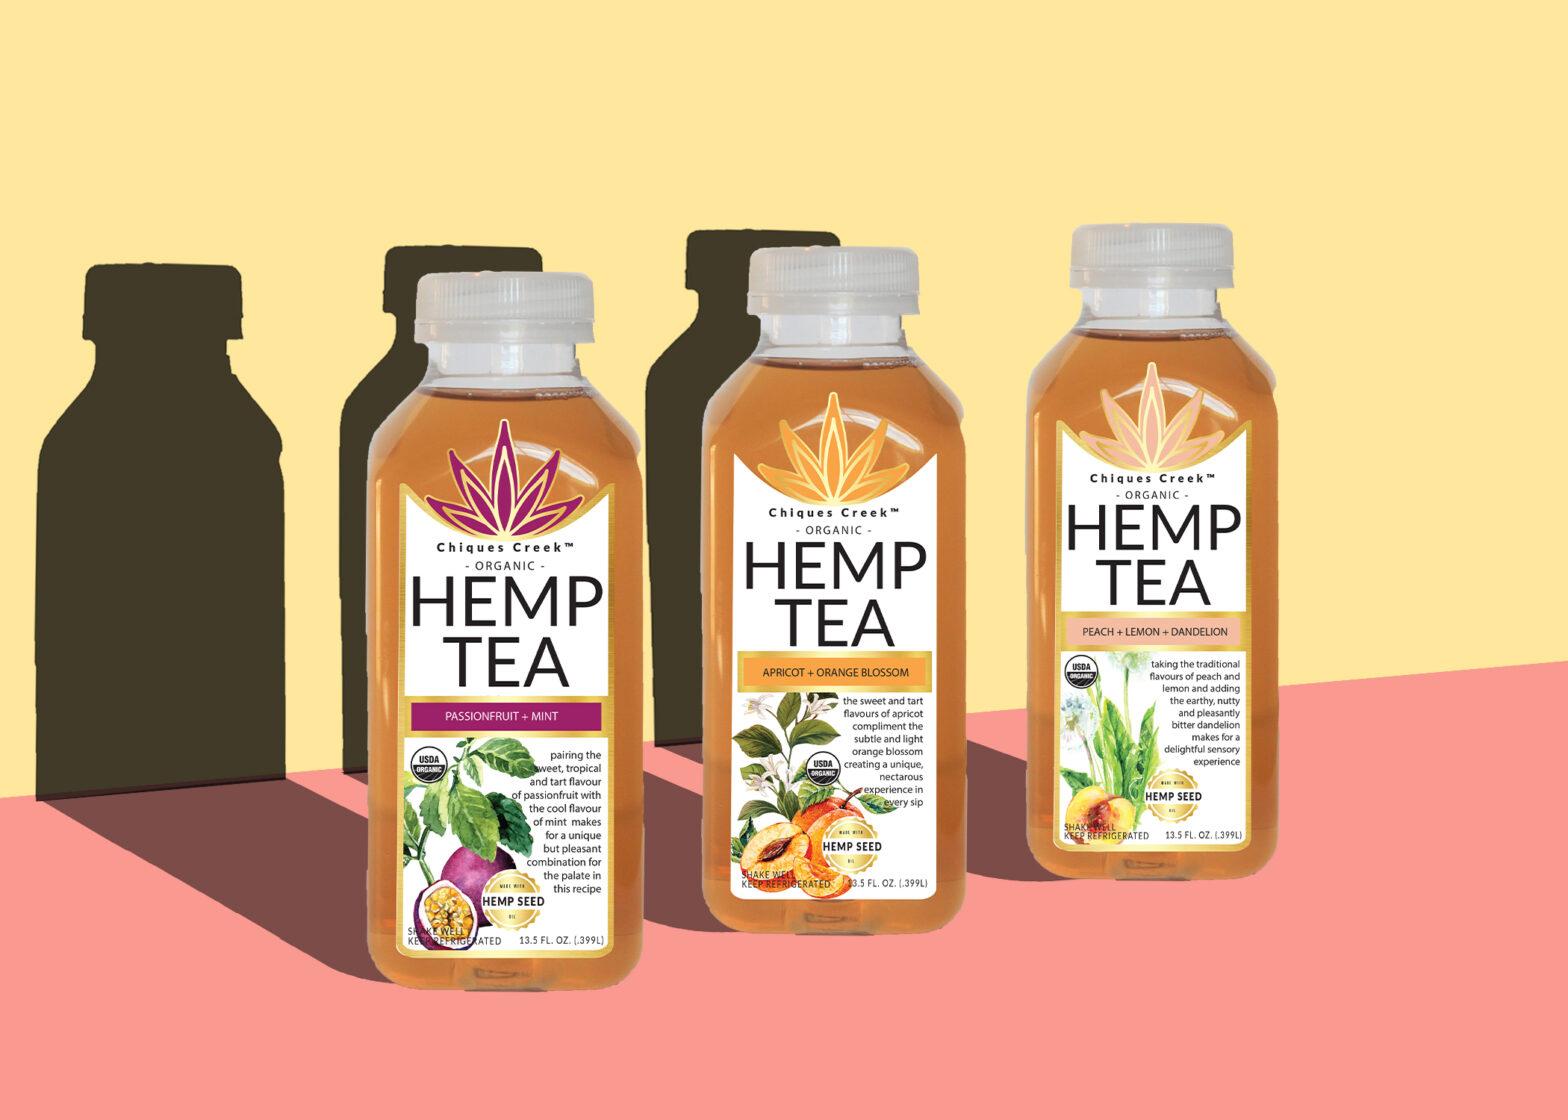 Three Flavour of Chiques Creek Hemp Tea